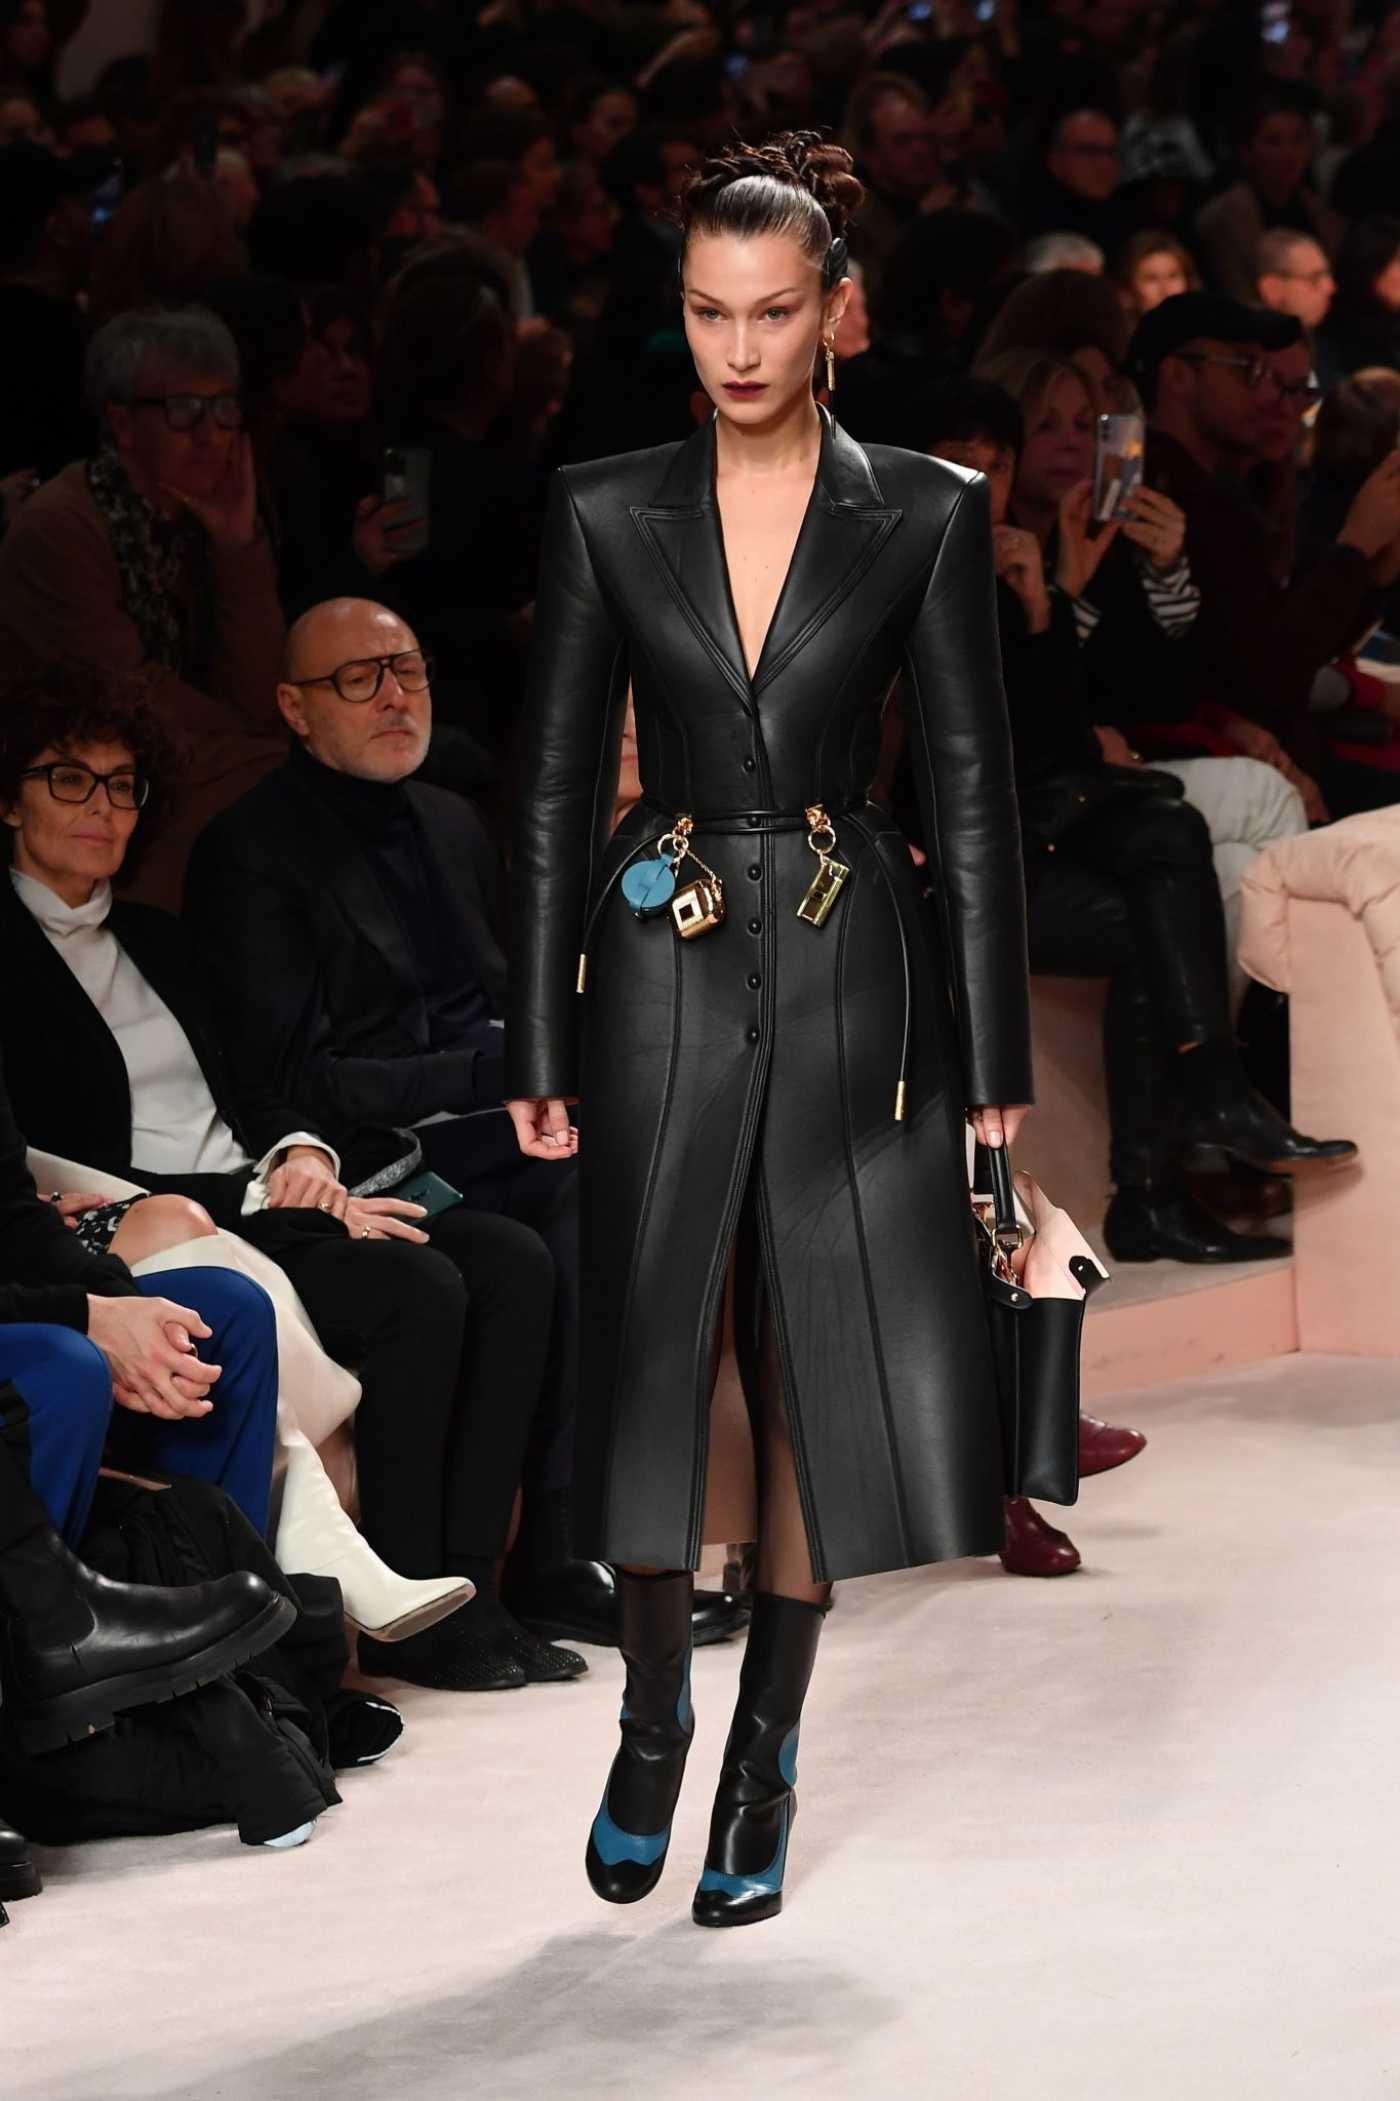 Bella Hadid Attends 2020 Fendi Fashion Show in Milan 02/20/2020